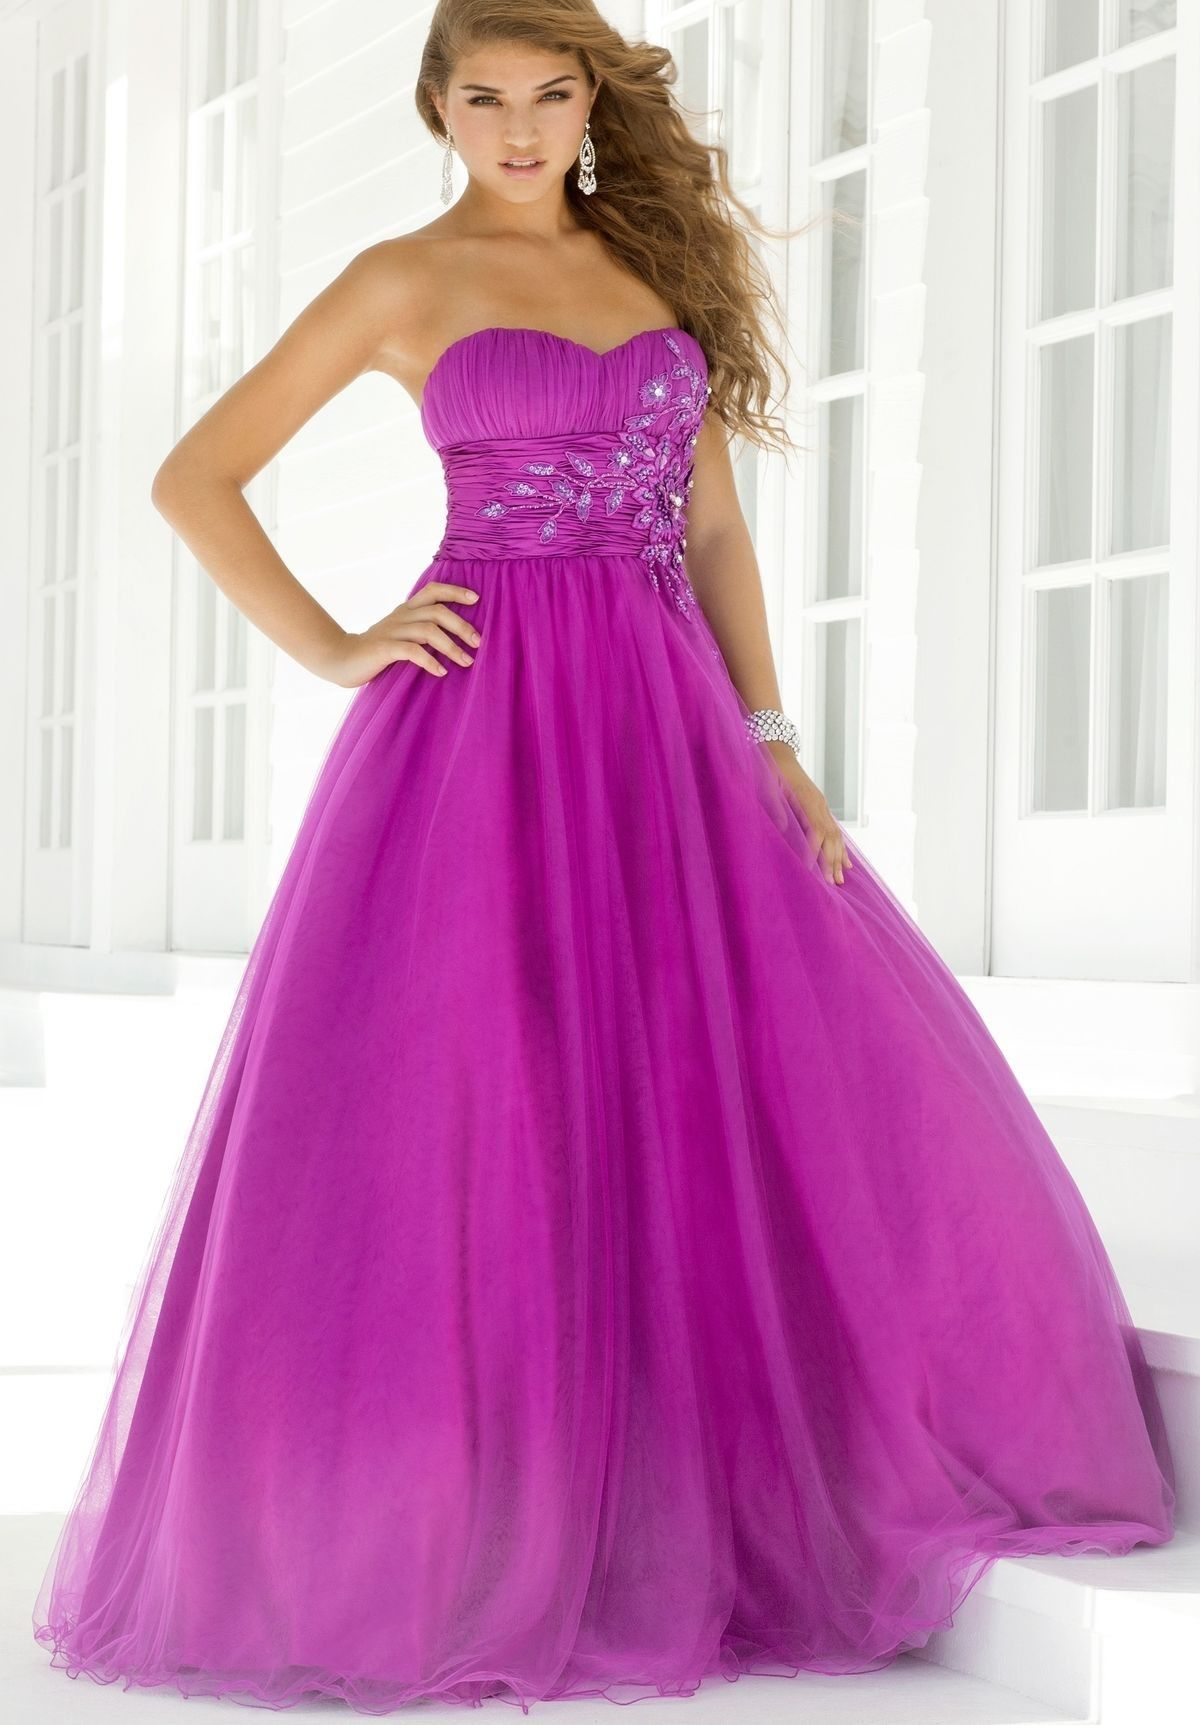 Asombroso Trajes Divertidos Prom Modelo - Colección de Vestidos de ...